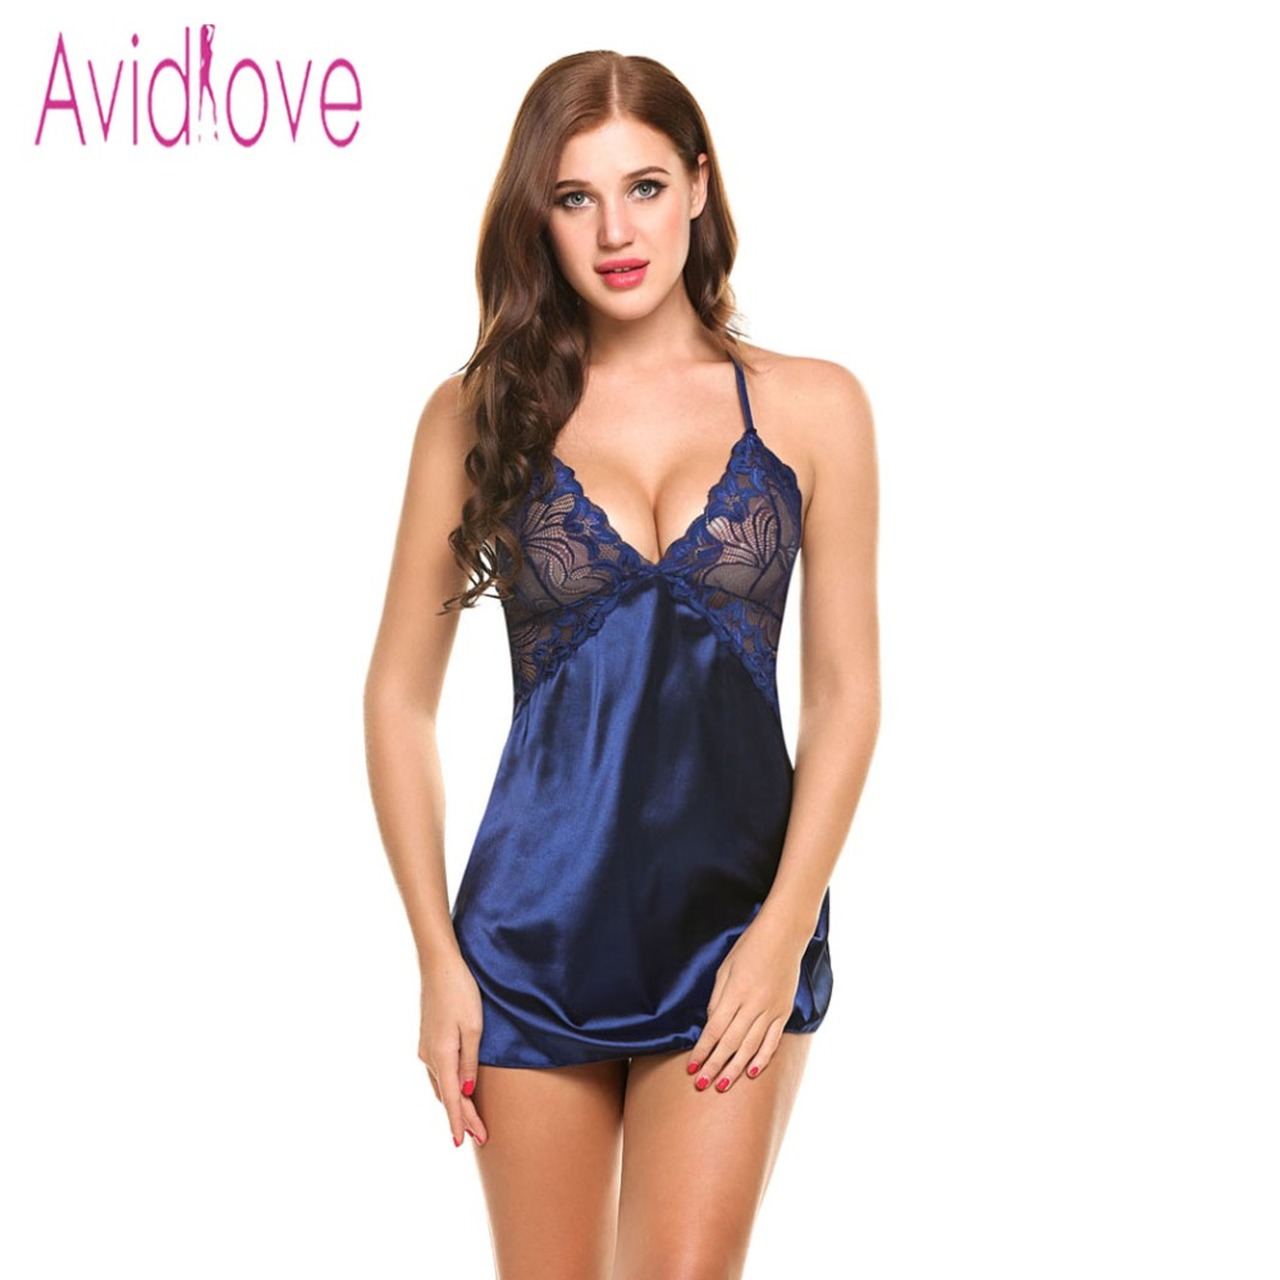 ... Avidlove Sexy Nightgown Lingerie Fashion Patchwork Nightdress Women  Sheer Scalloped Satin Nightwear Silk Slip Sleepwear Chemises ...